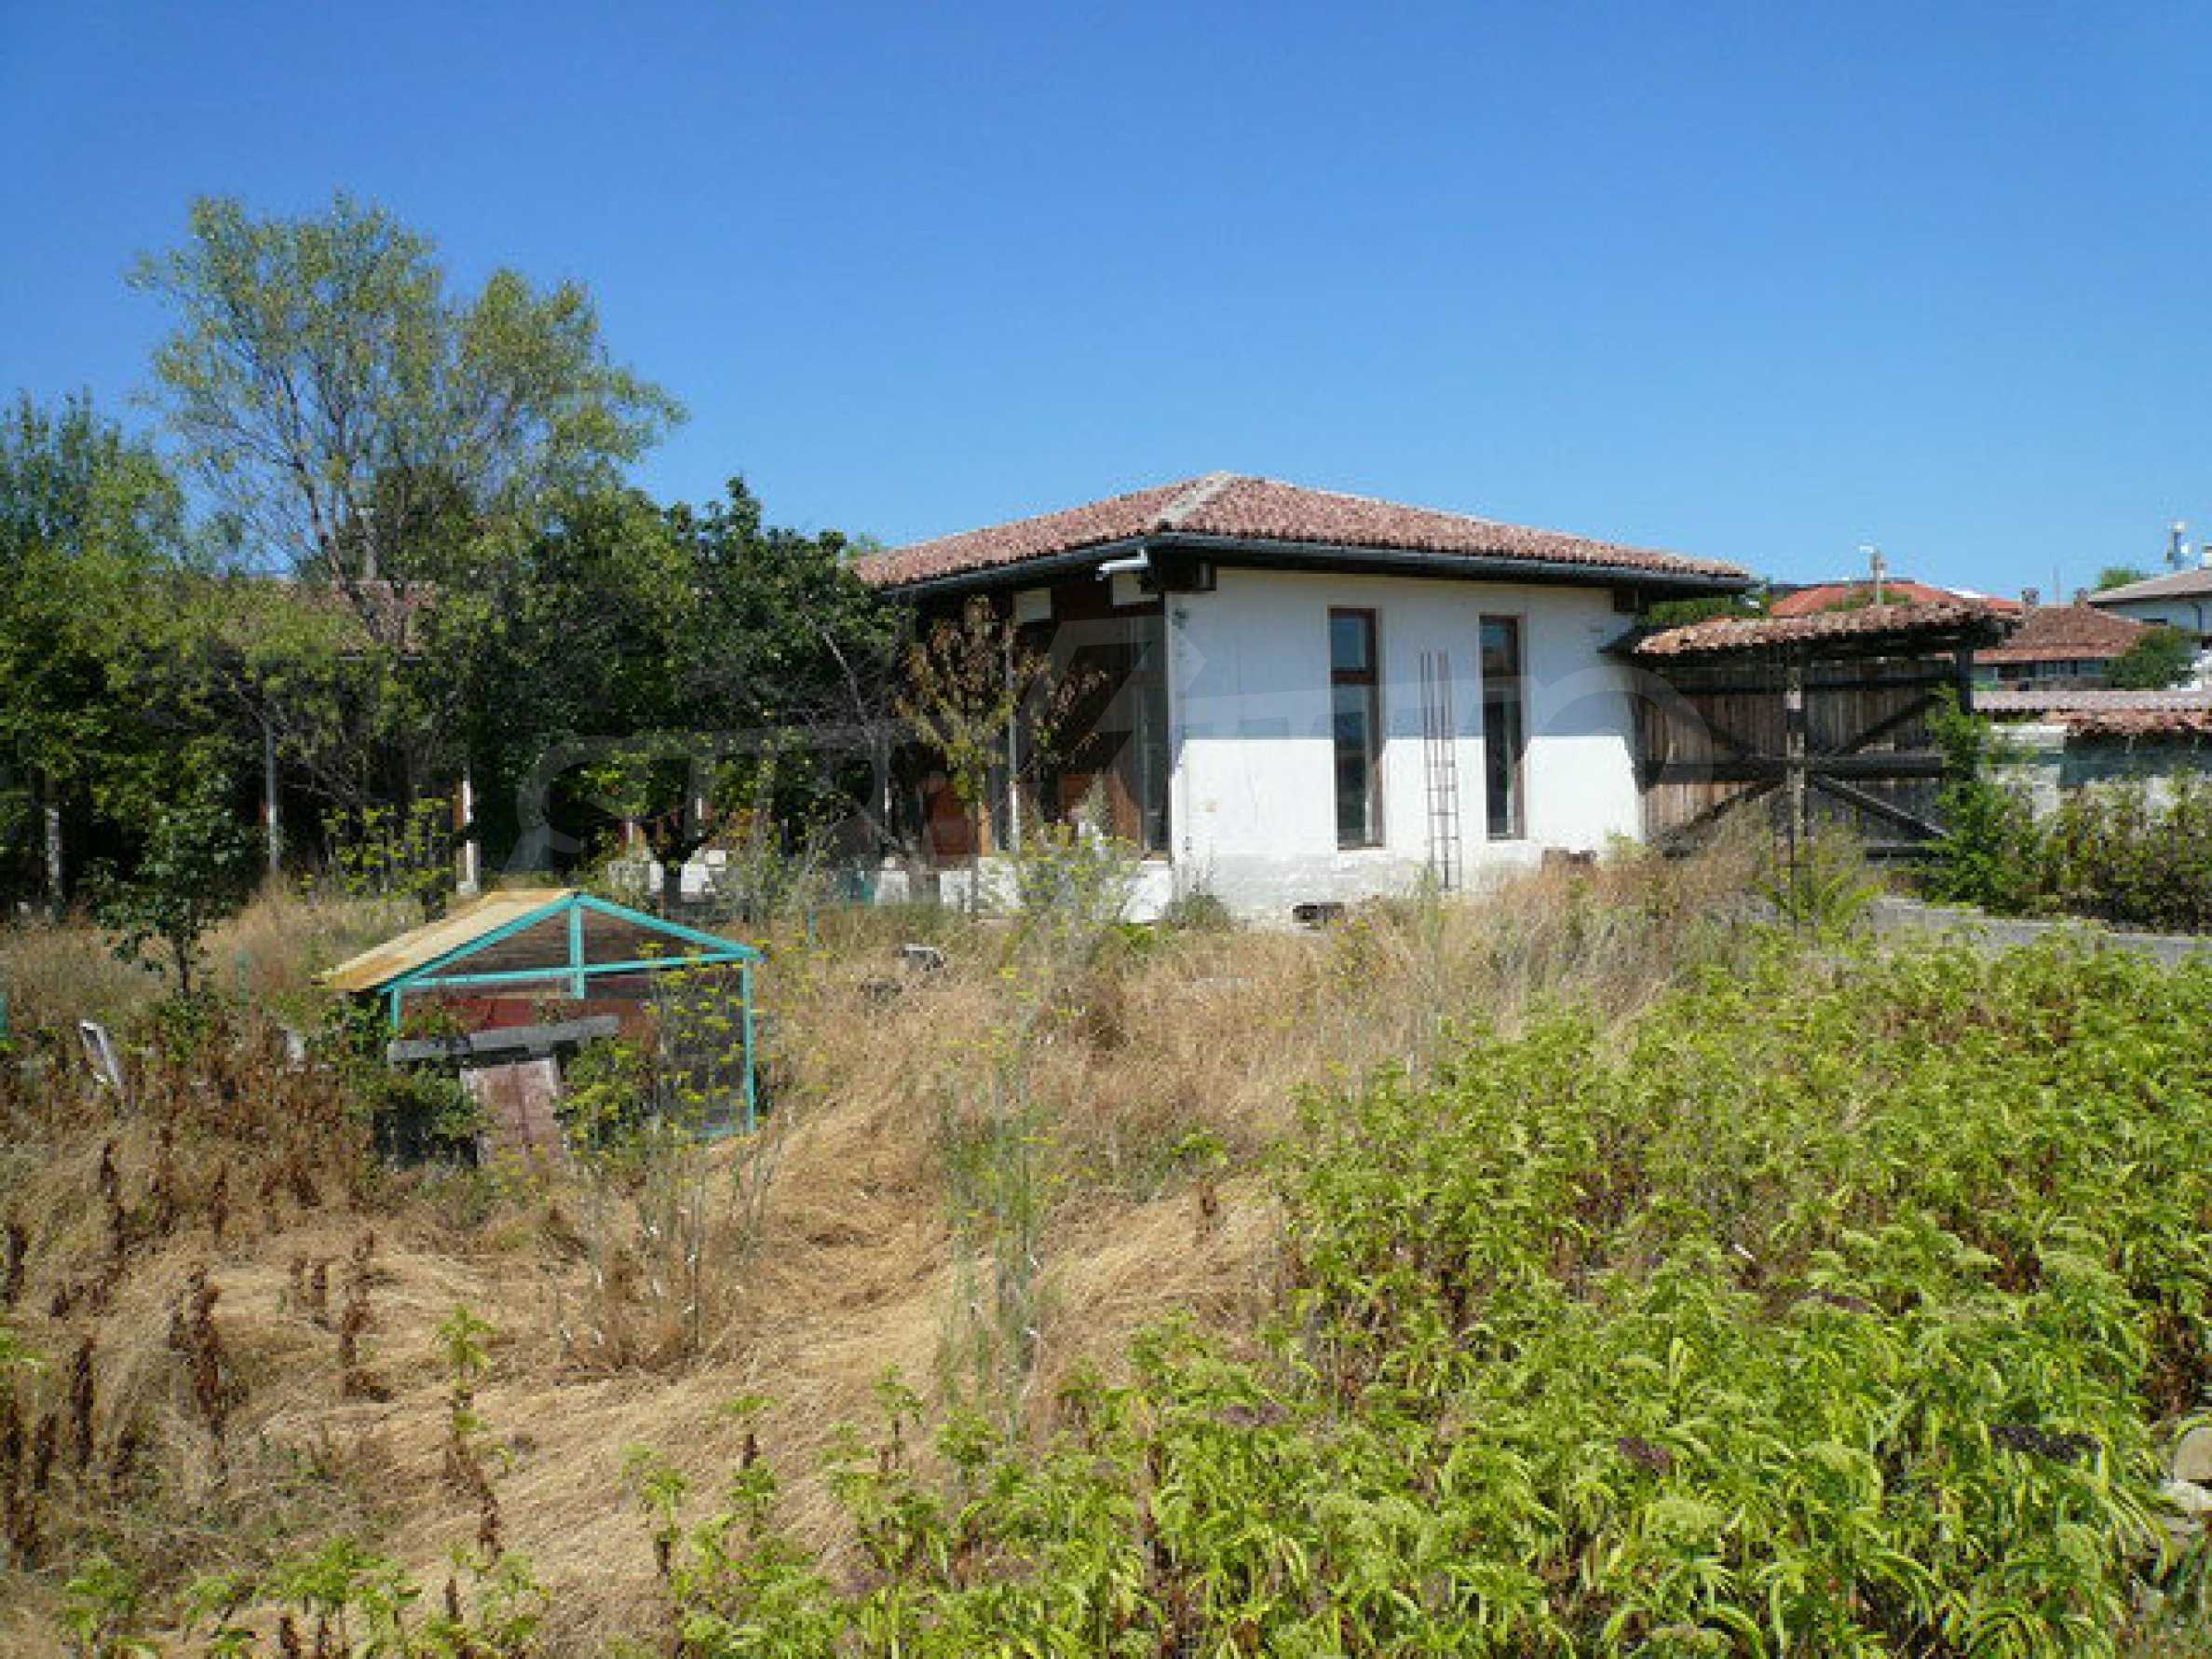 Renoviertes Haus nur 3 km von Veliko Tarnovo entfernt 47